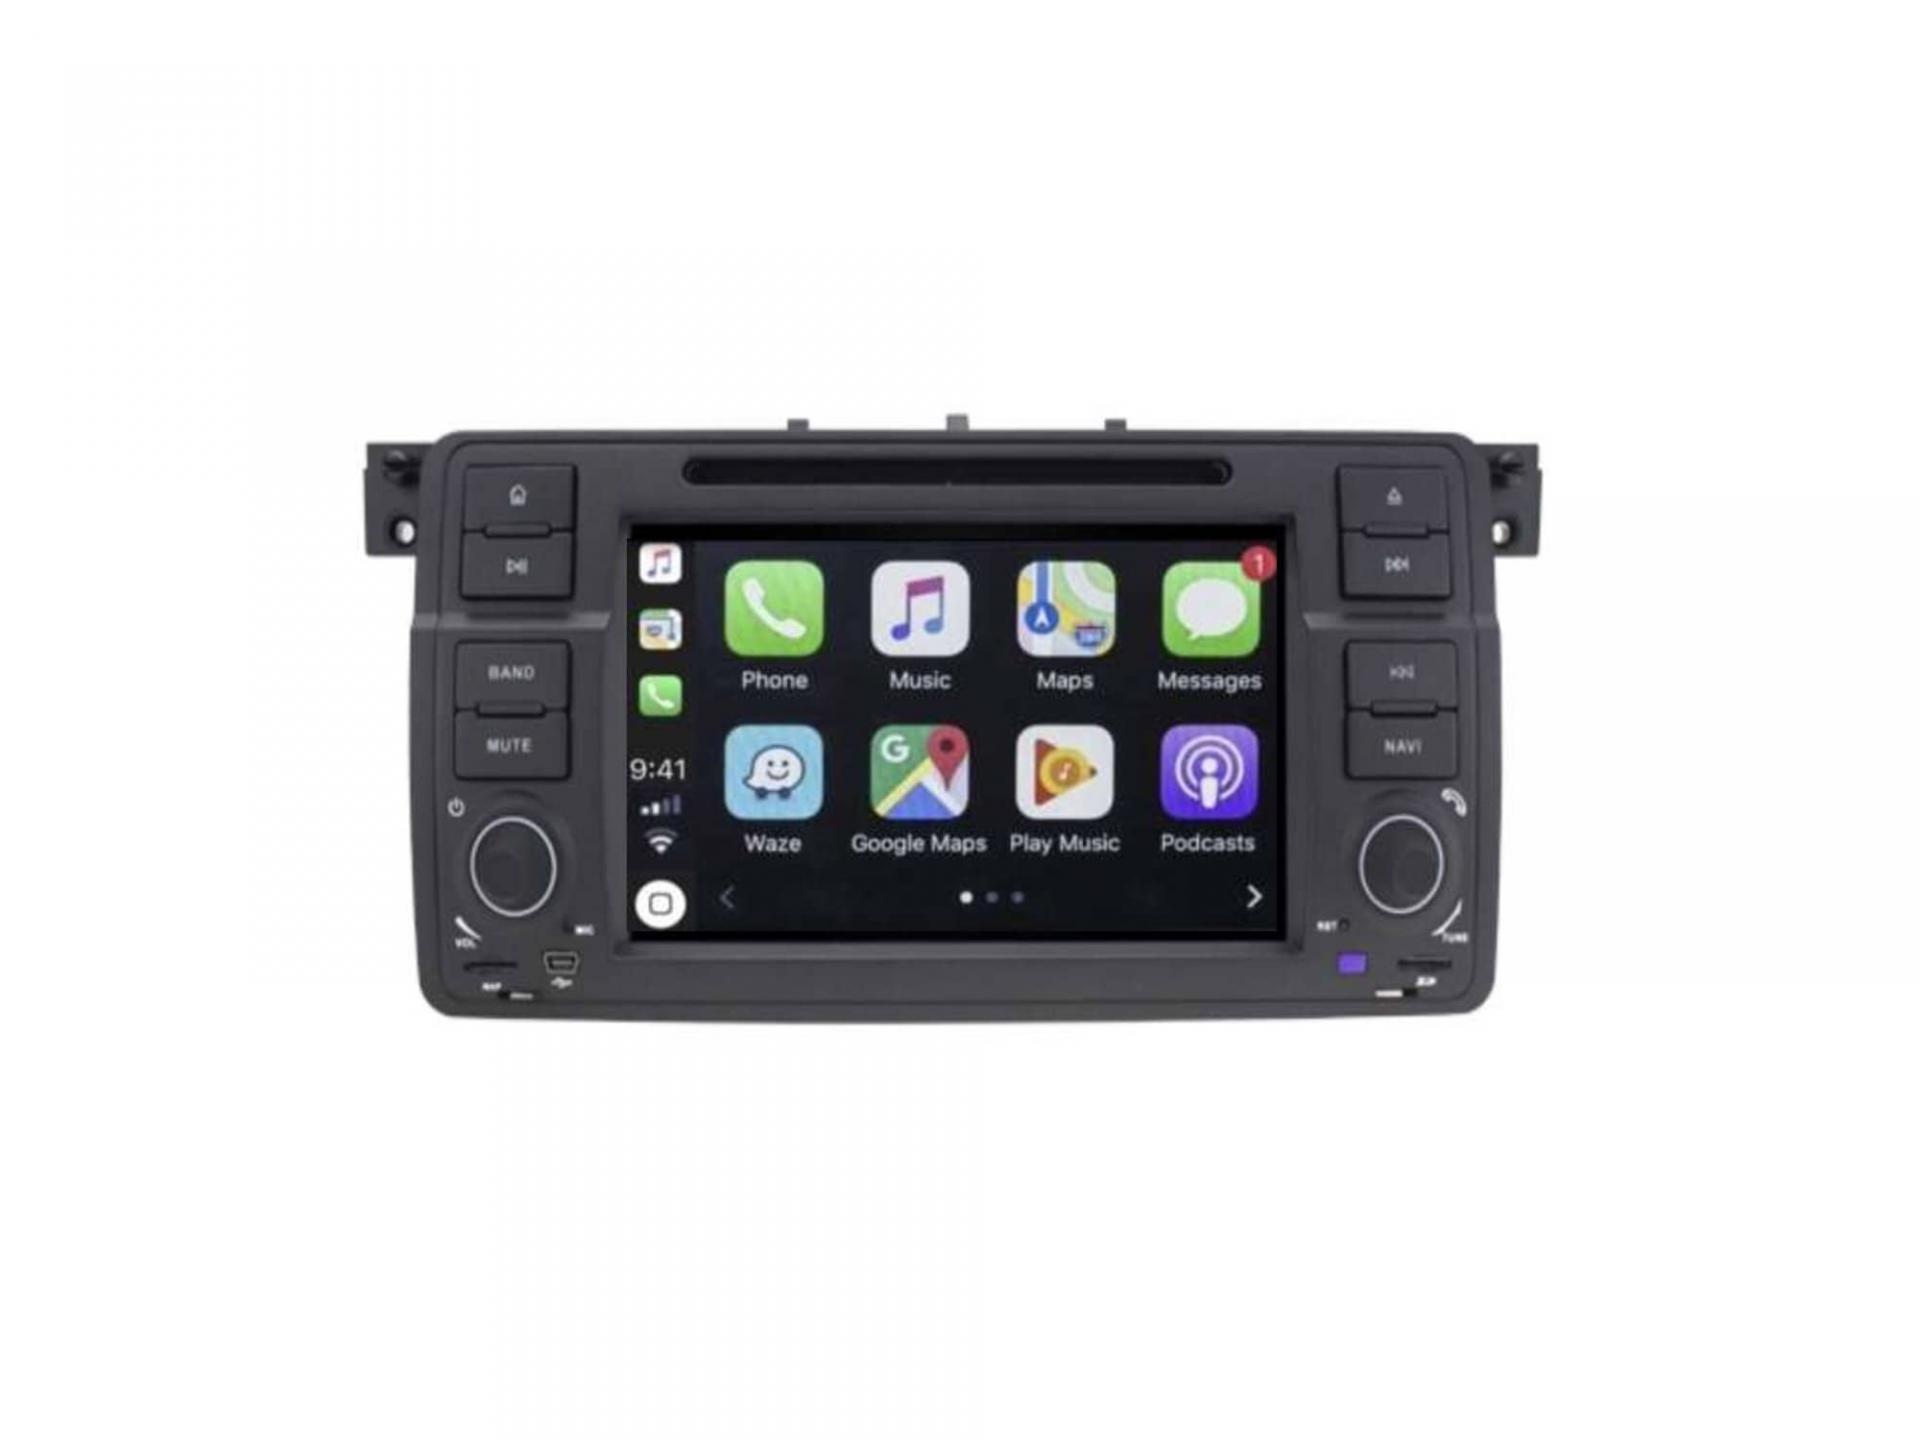 Autoradio gps carplay android auto bluetooth bmw serie 3 e46 harman kardon 5